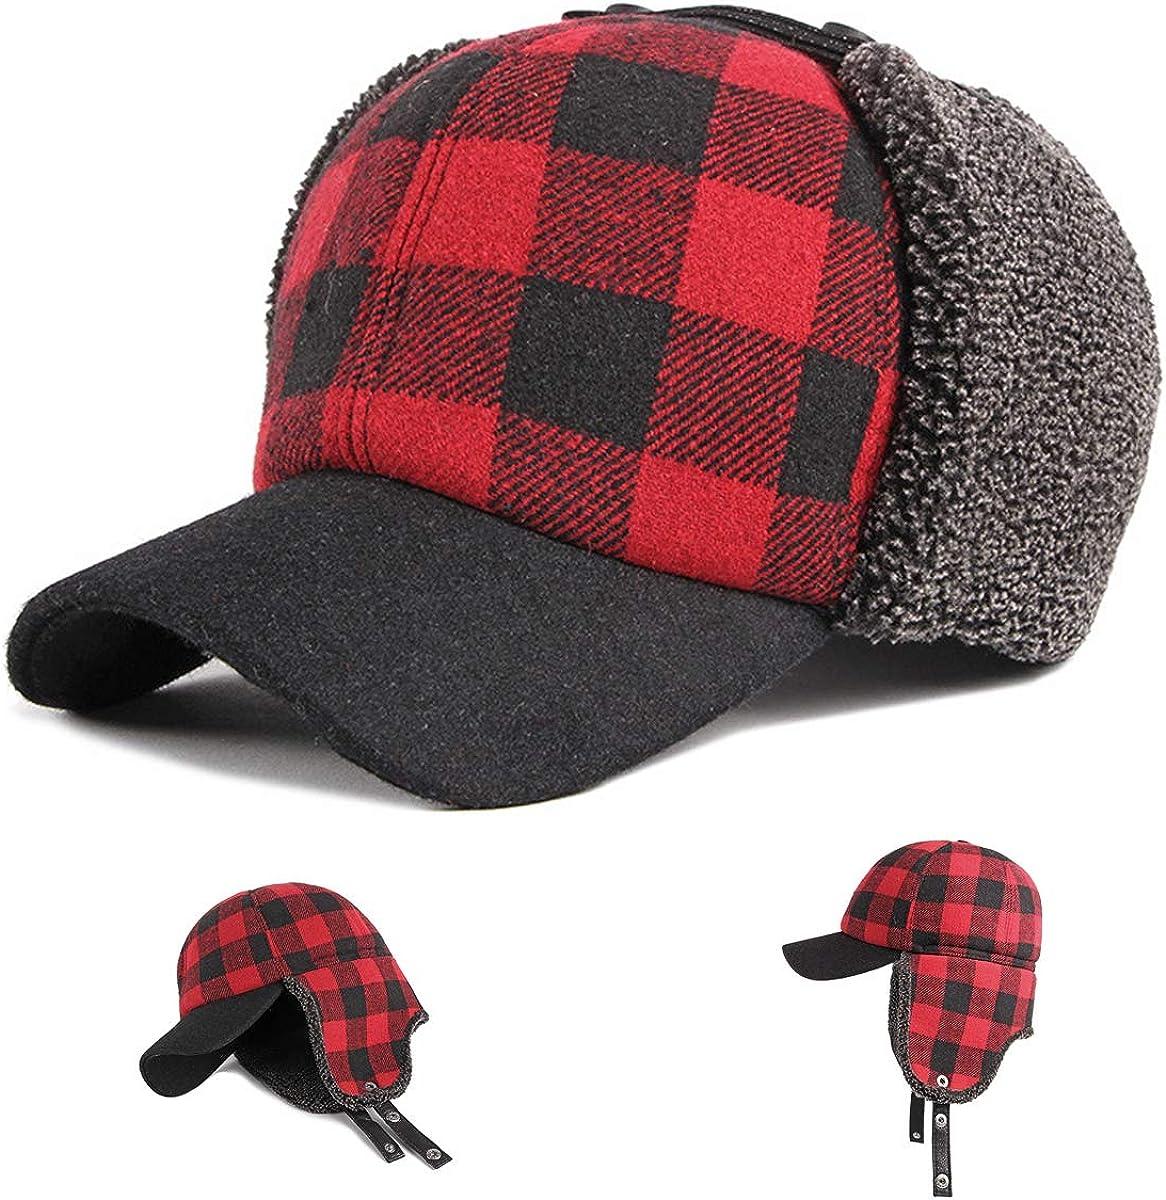 HunterBee Winter Trapper Baseball Cap Hat Thick Sherpa Earflaps Buffalo Plaid fold Sherpa Earflaps Warm Black and Red